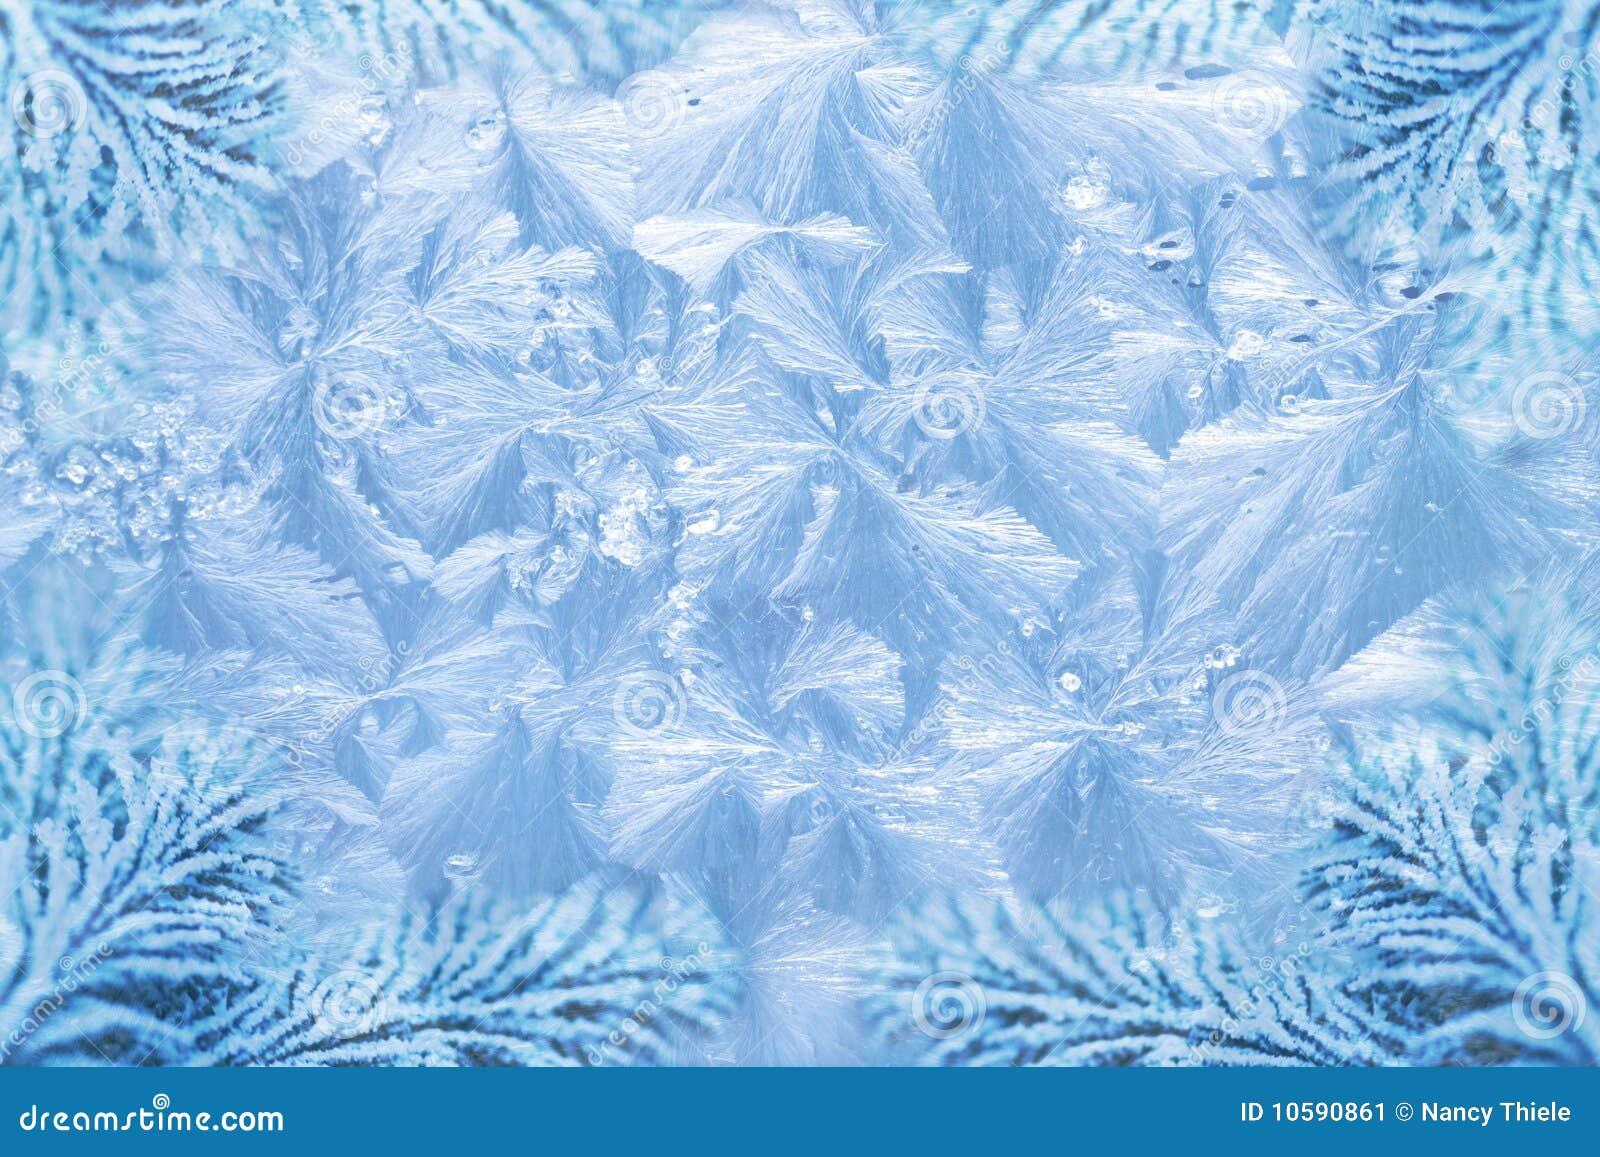 Jack frost ice crystal patterns & snowy spruce